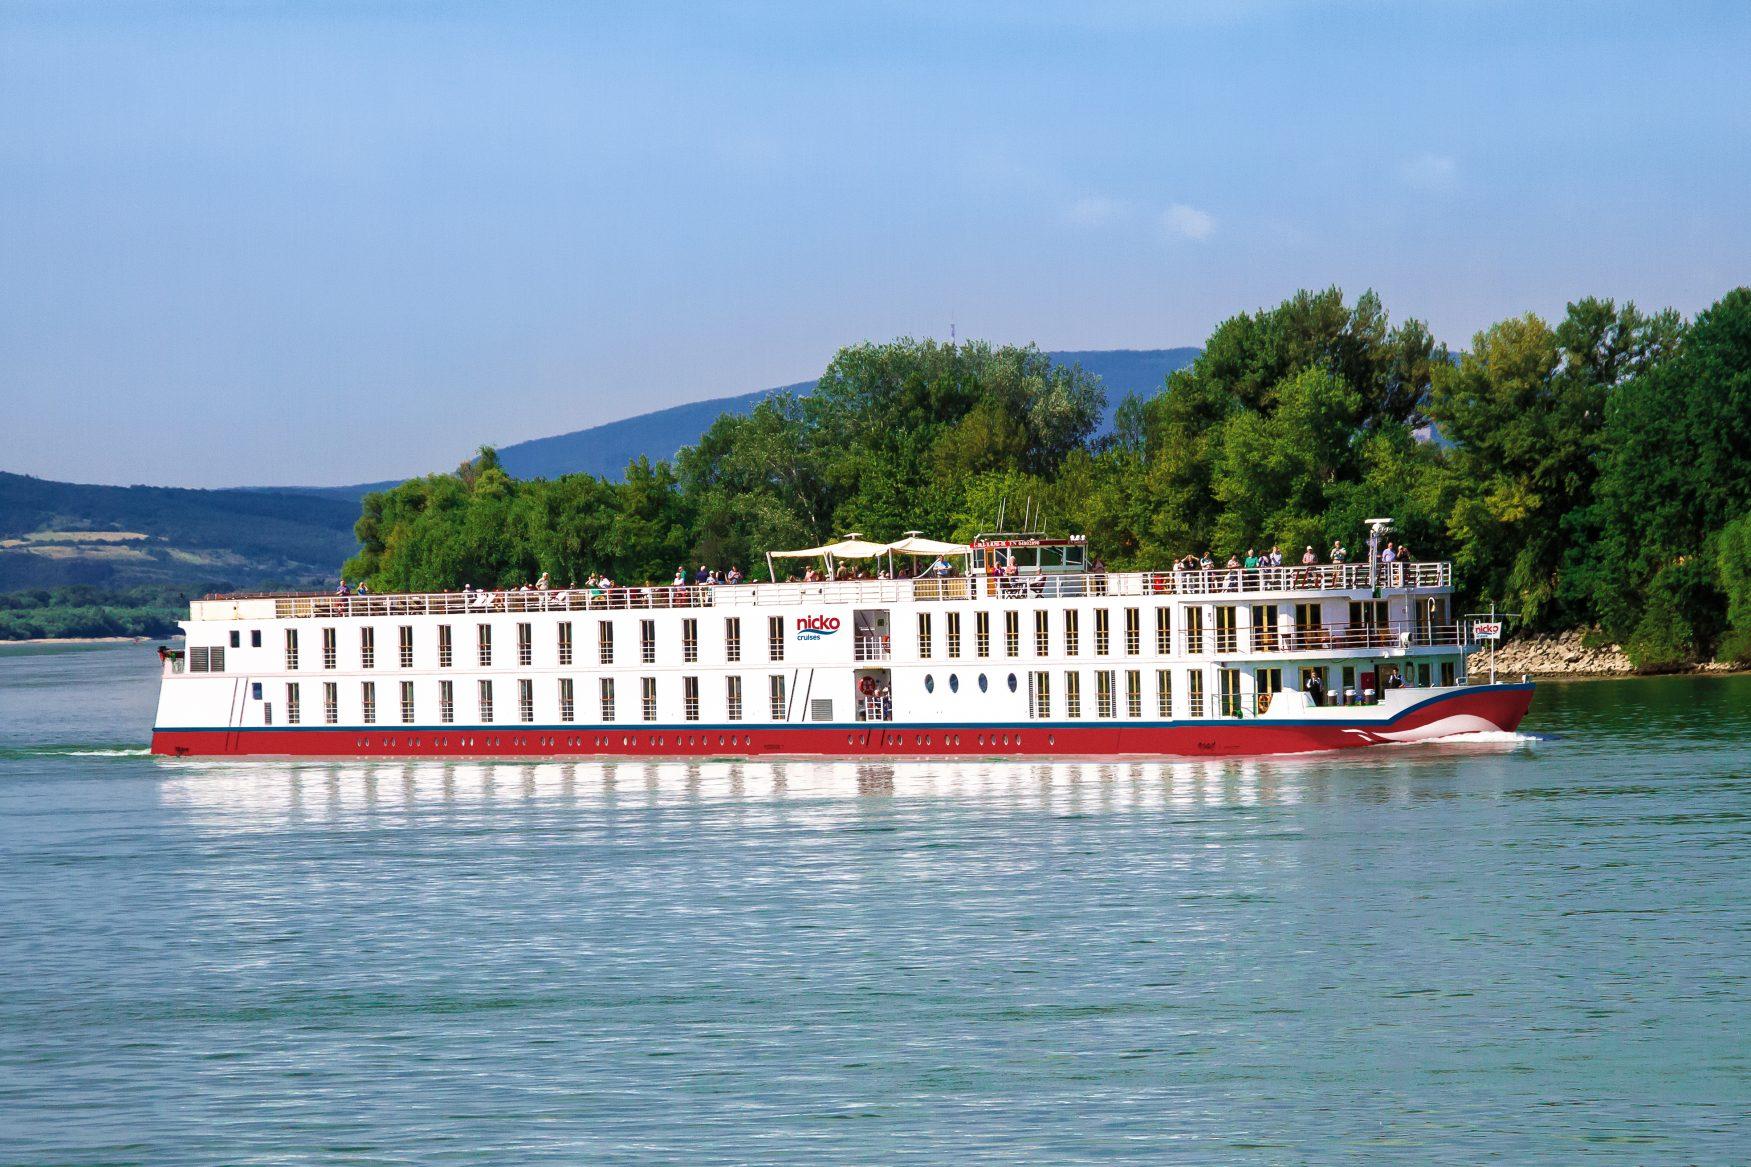 MS HEIDELBERG 2018 auf dem Rhein Foto: nicko cruises